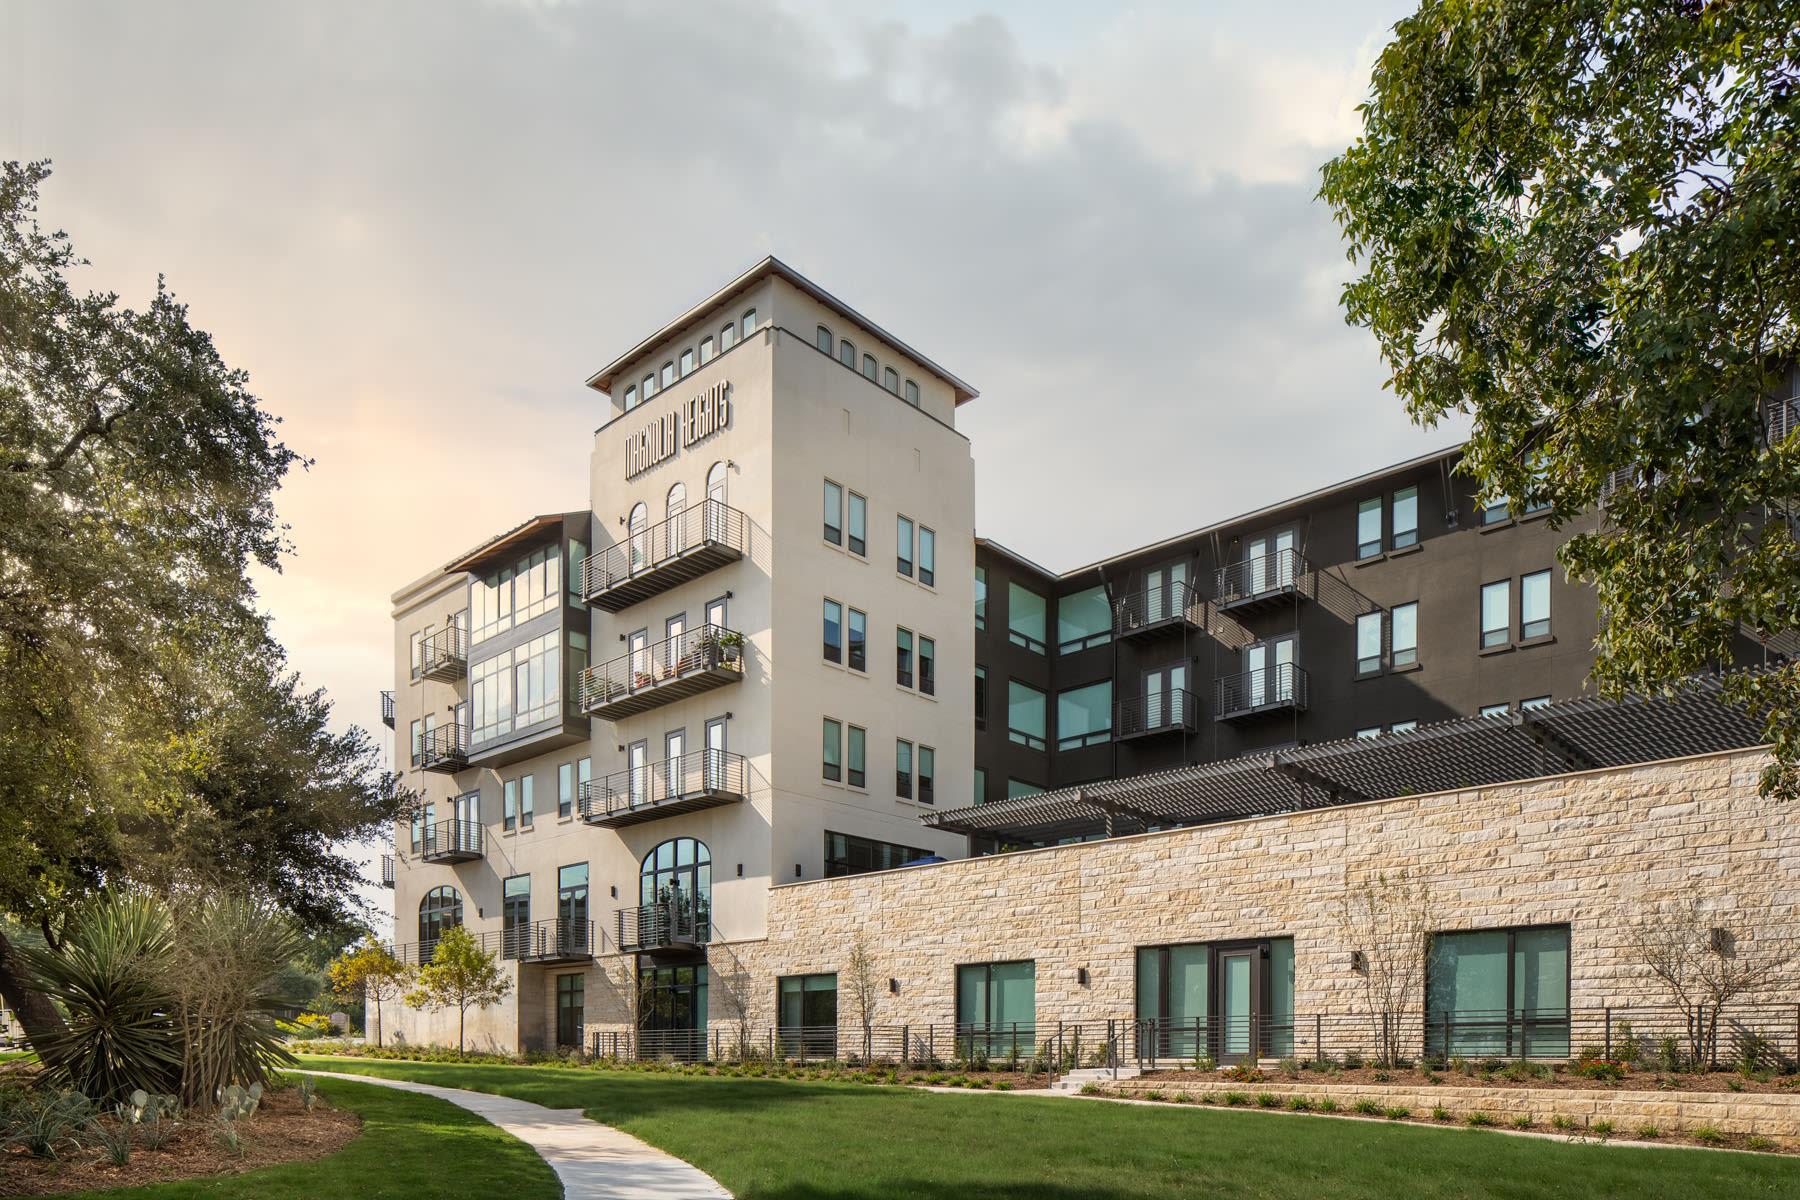 Exterior of the Magnolia Heights building in San Antonio, Texas